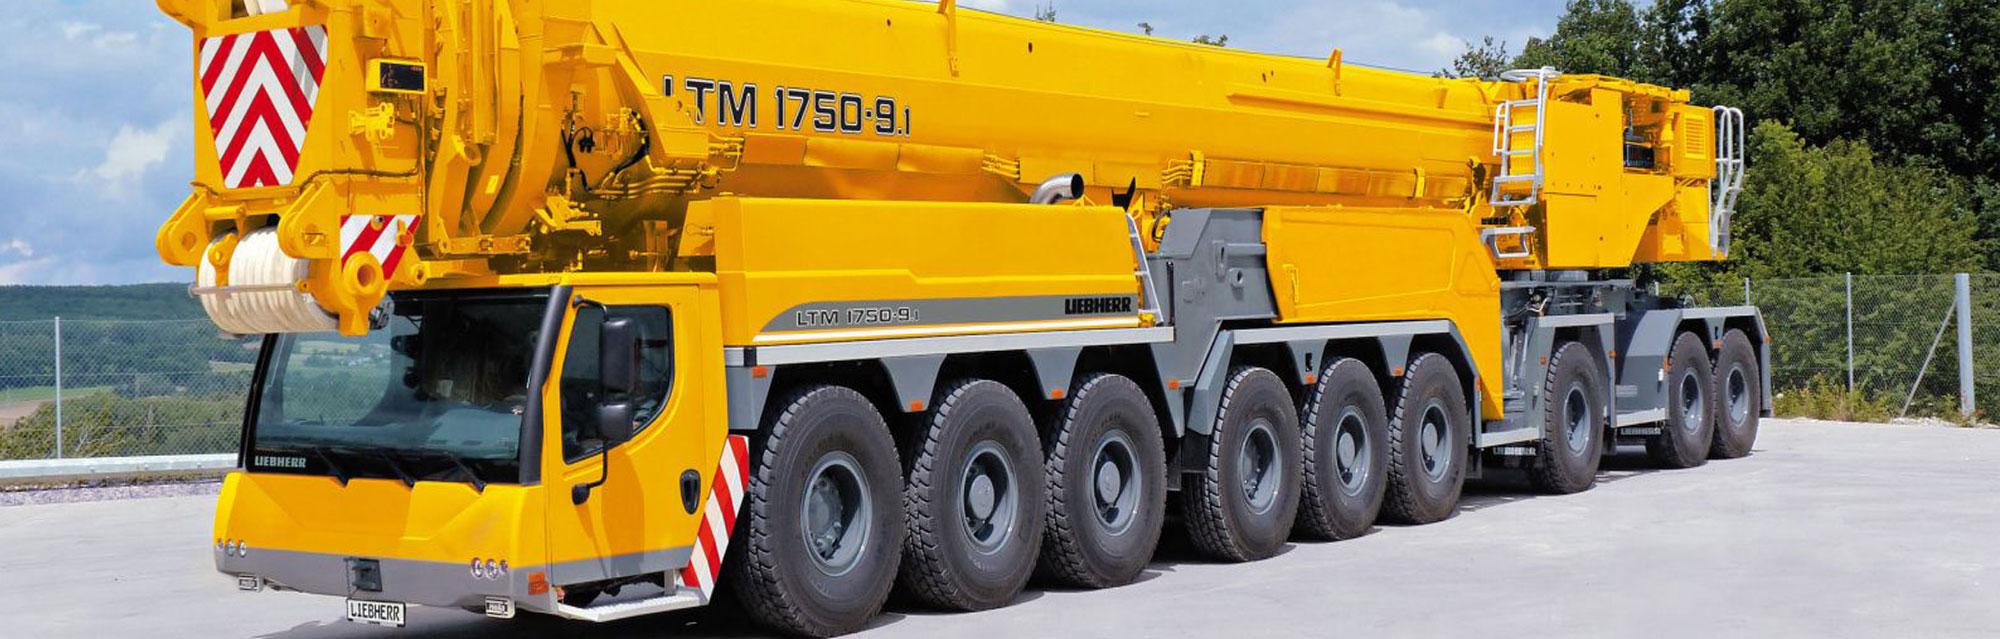 Used Crane Spare Parts : Cranes international used trucks heavy equipment trading